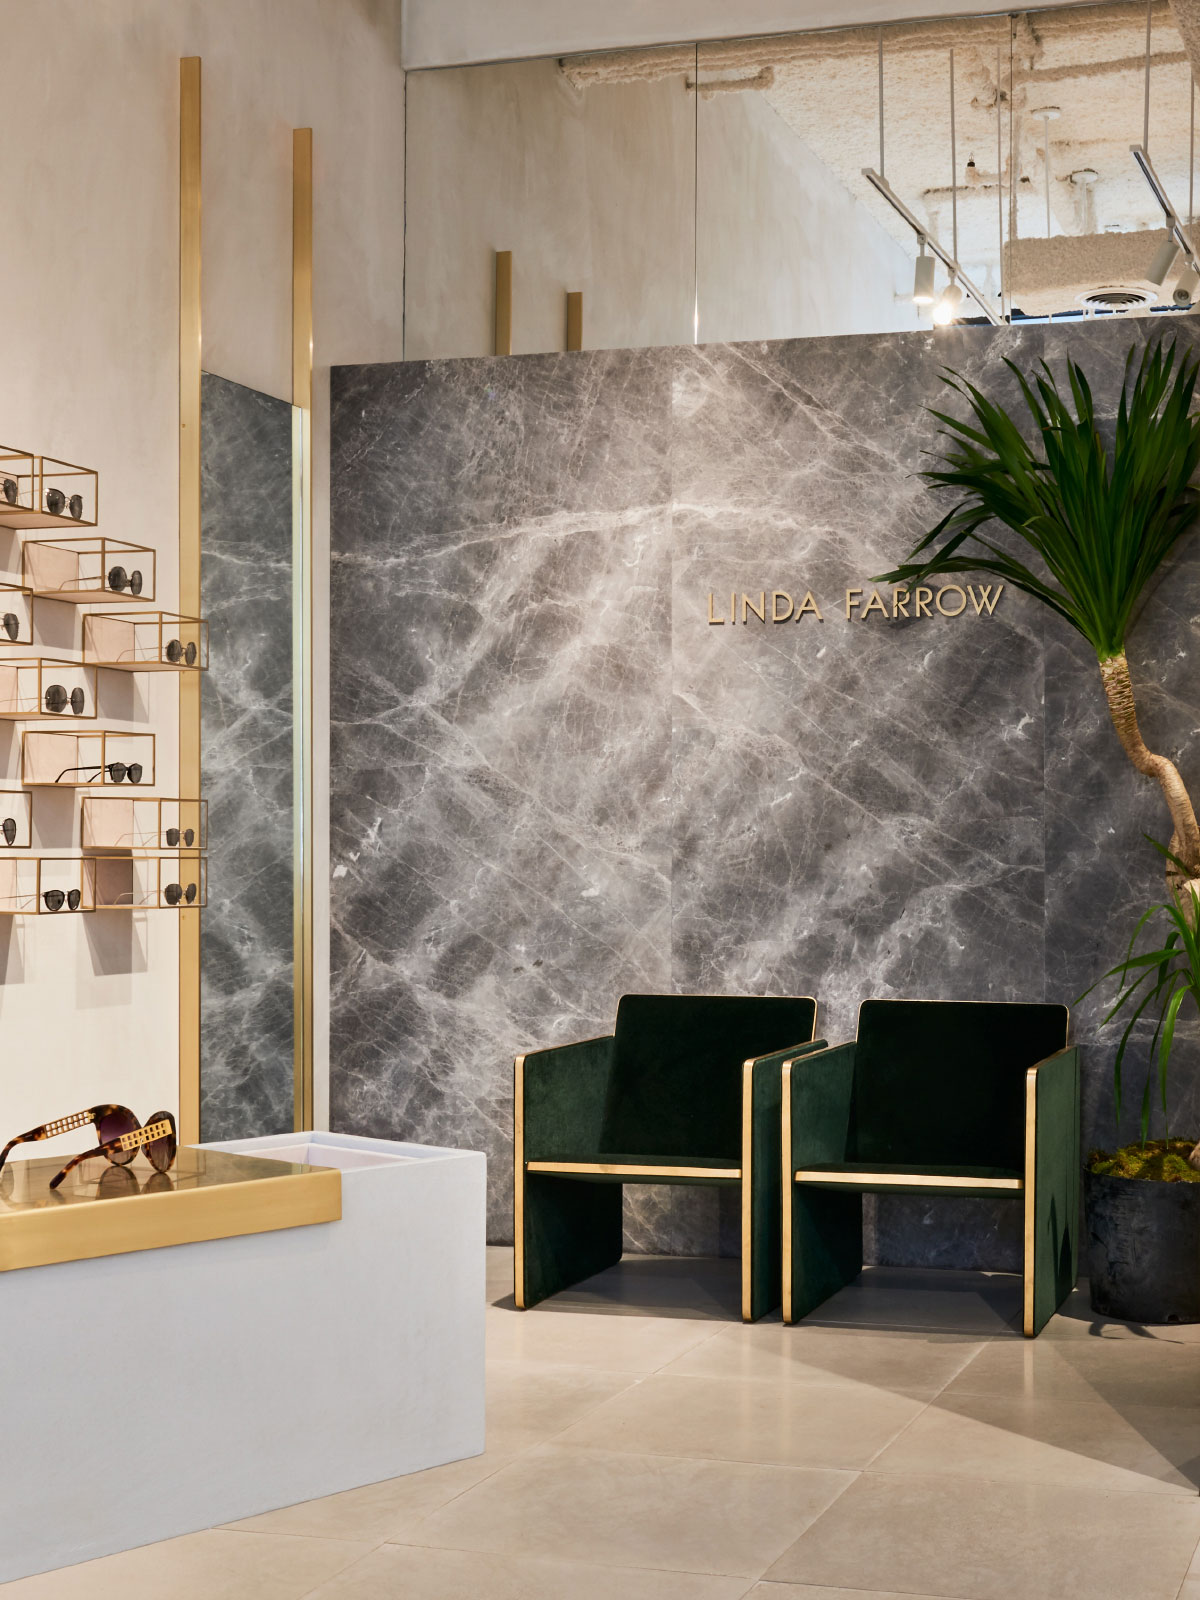 Studio Giancarlo Valle Designs Linda Farrow's First US Store in SoHo, New York City   Yellowtrace